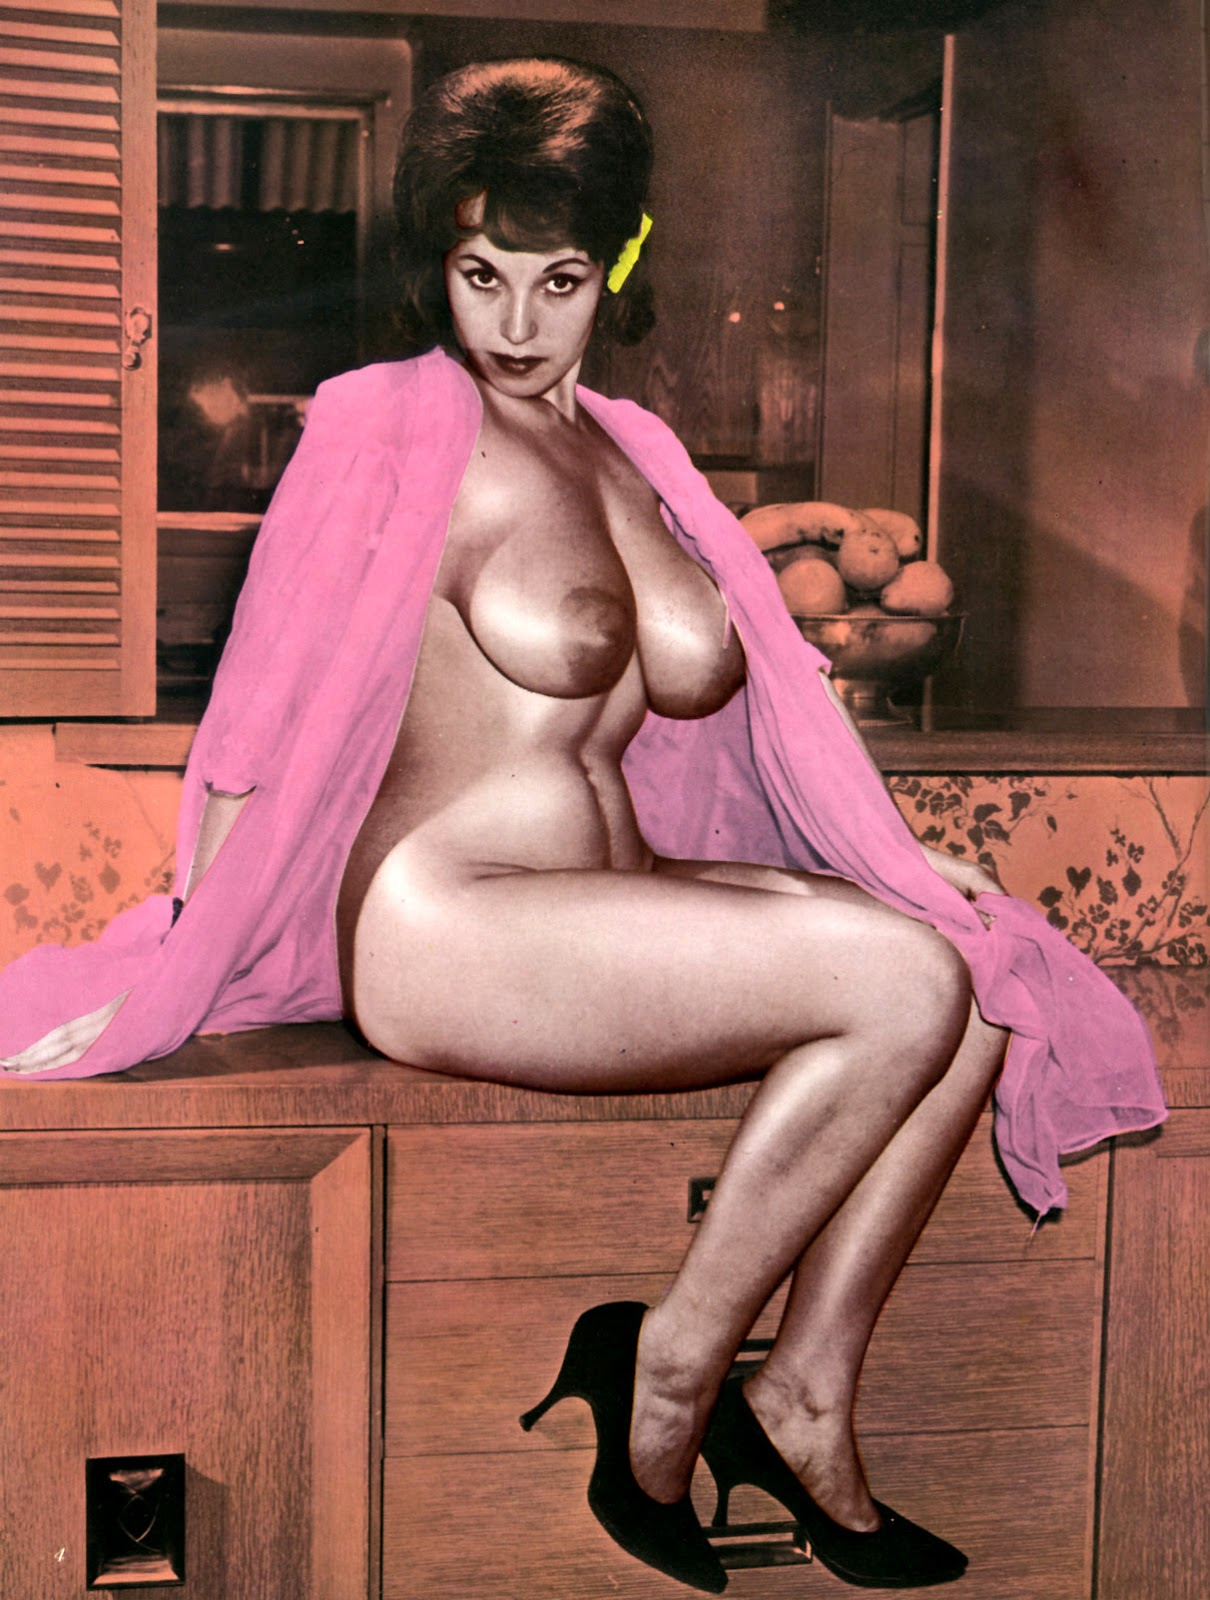 Belinda stewart wilson xxx, bangladeshi naked sexy collage girls pictures